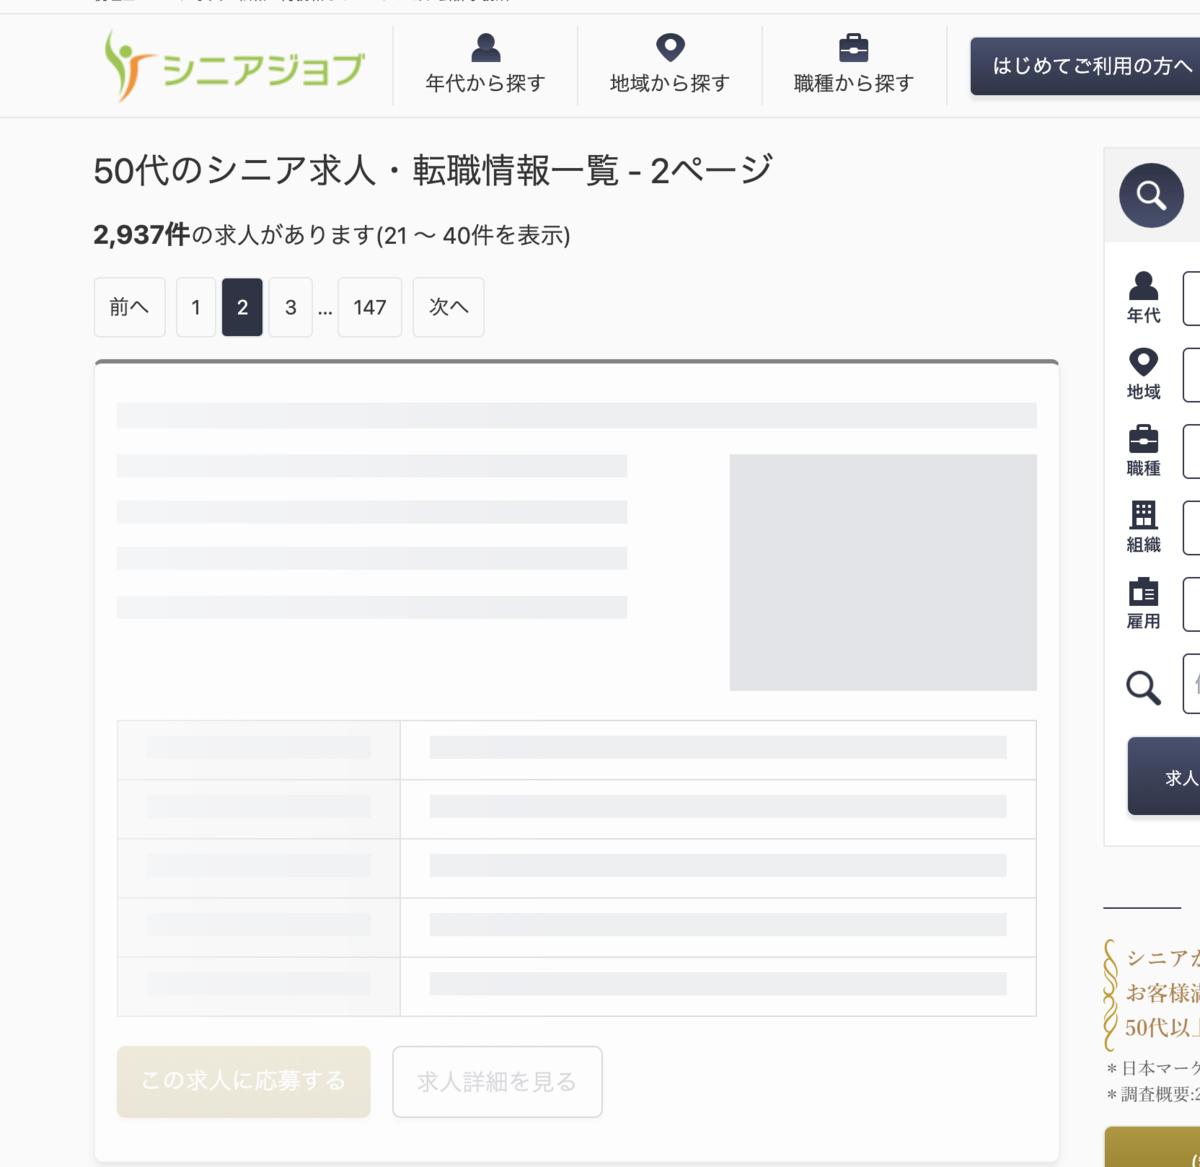 f:id:uyamazak:20210730174739p:plain